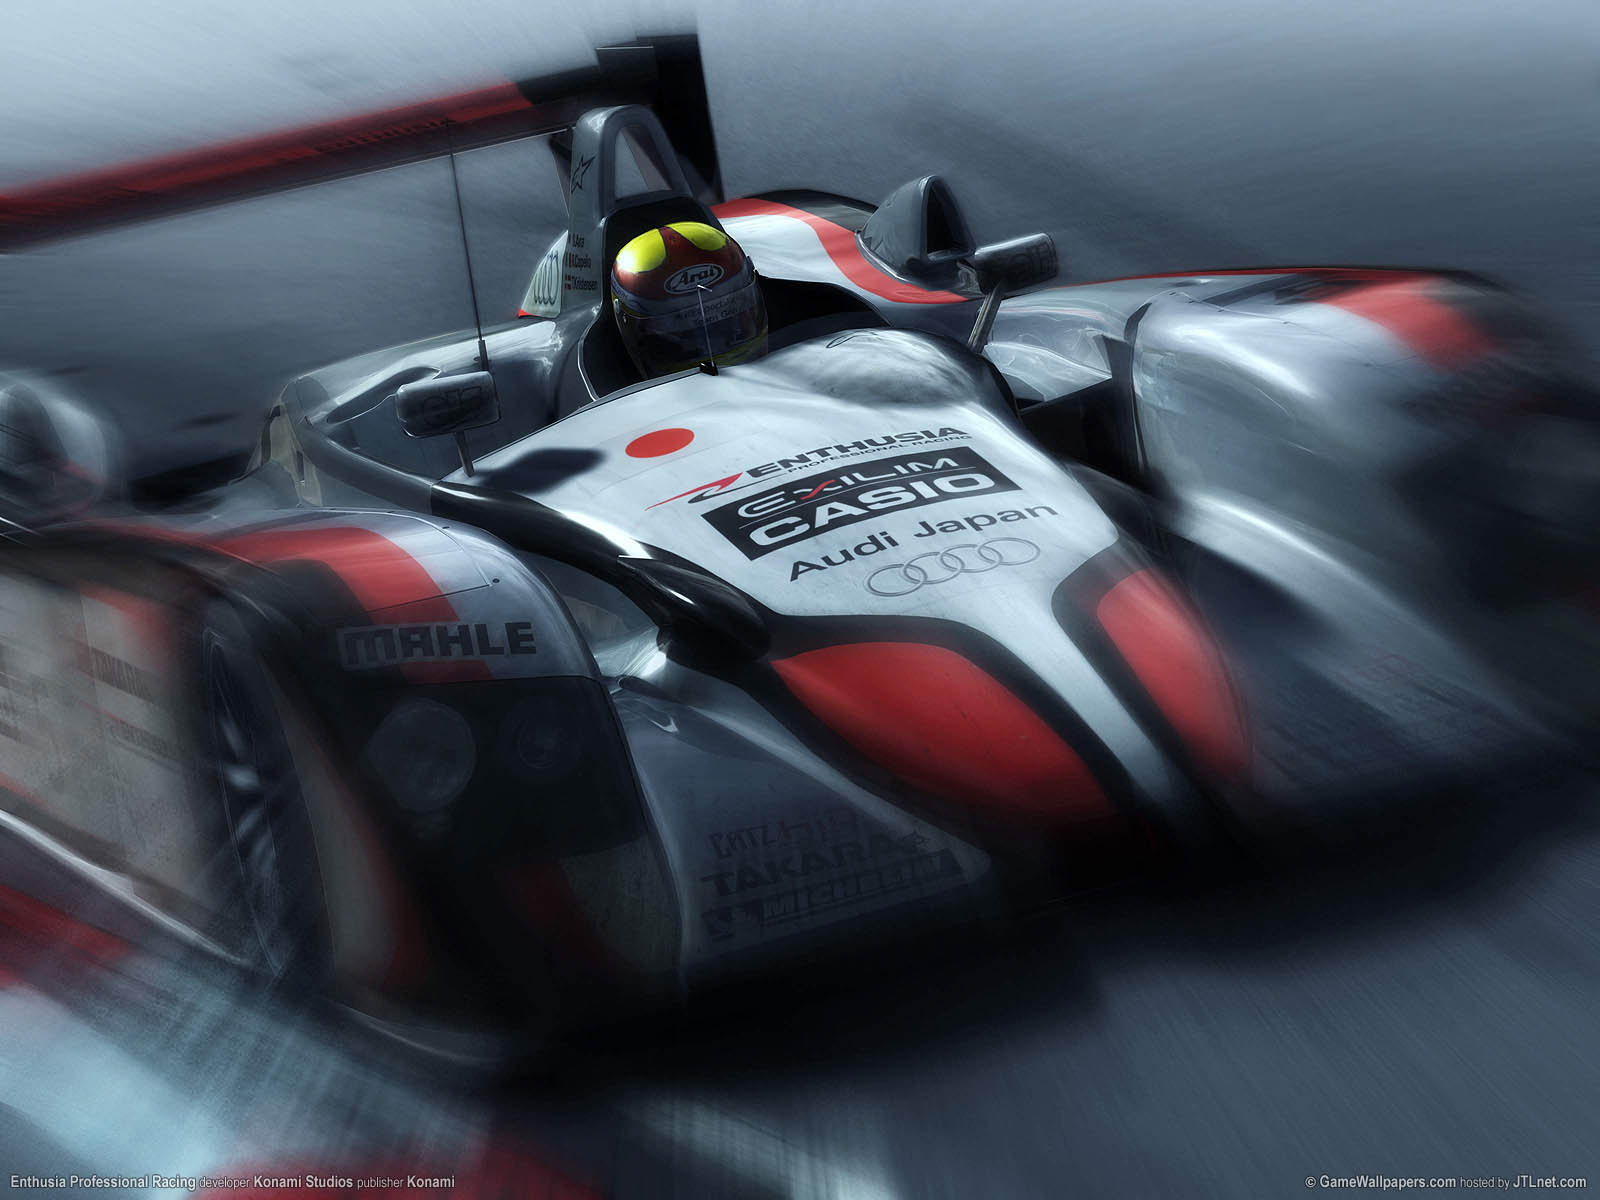 Enthusia Professional Racing Hintergrundbild 03 1600x1200